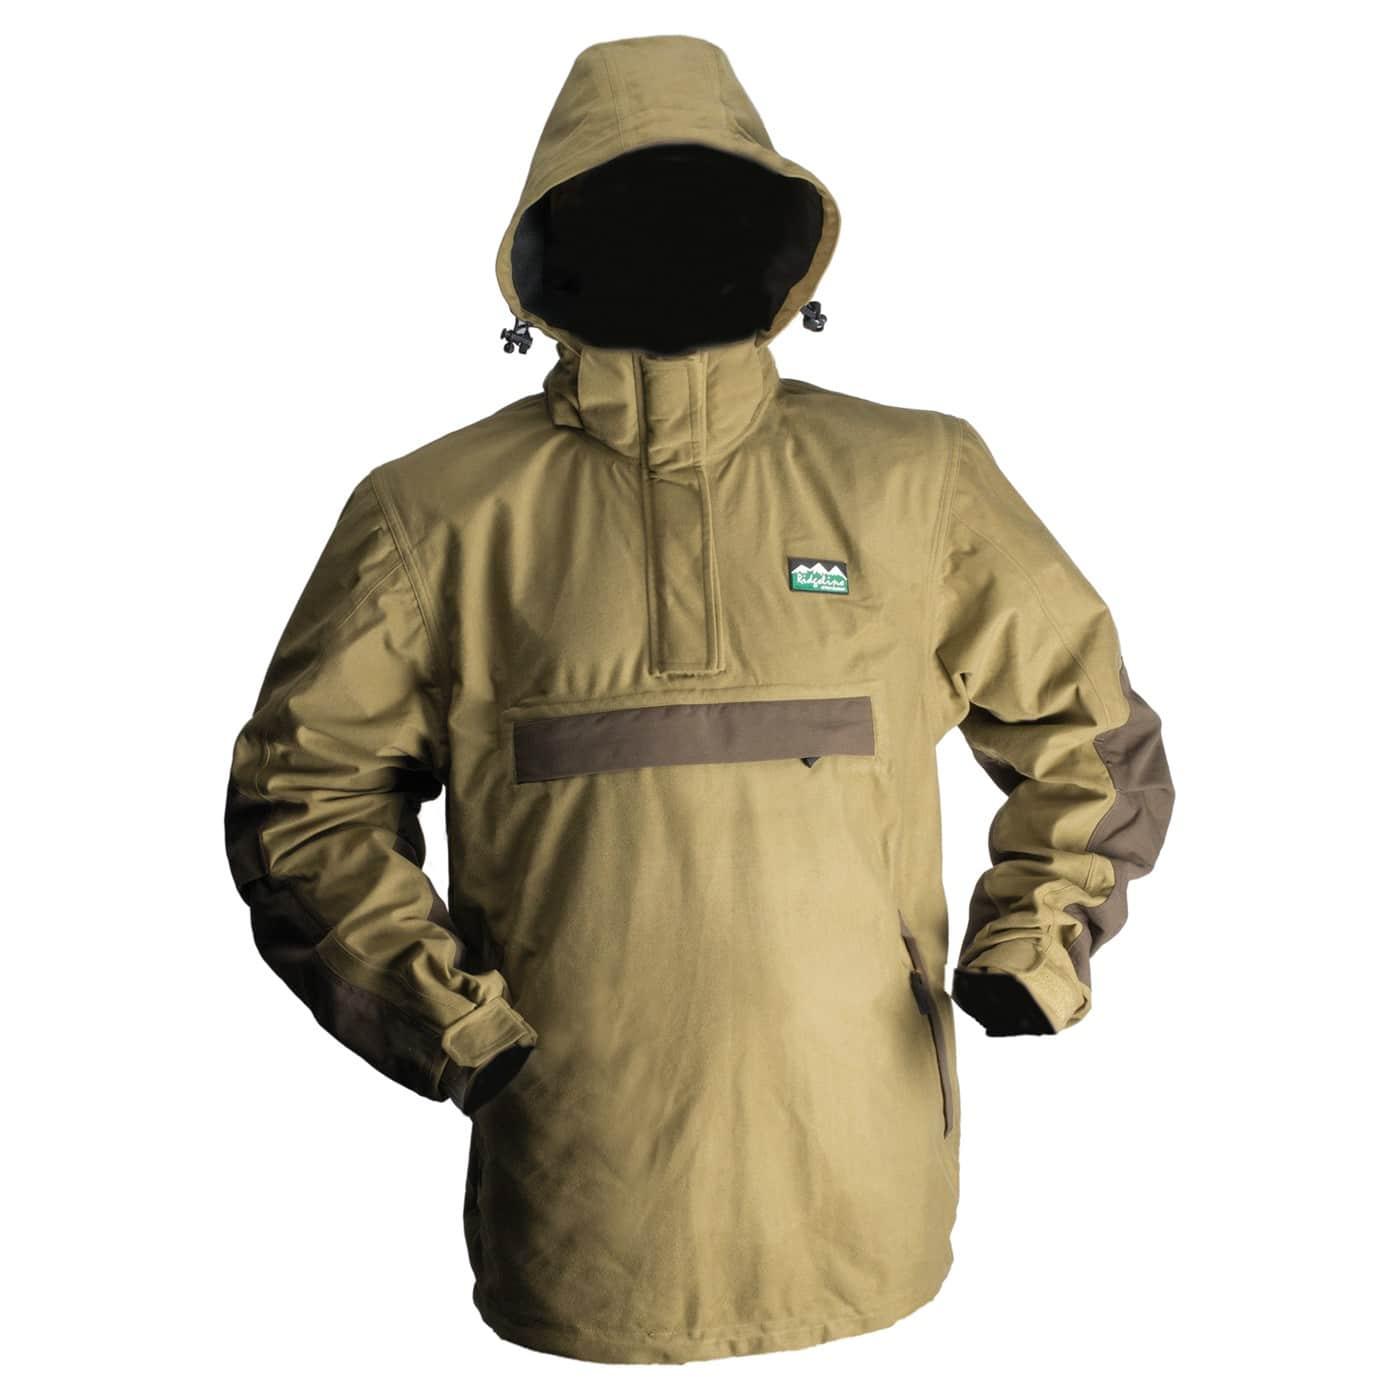 Ridgeline Pintail Explorer Waterproof Smock Jacket - Teak